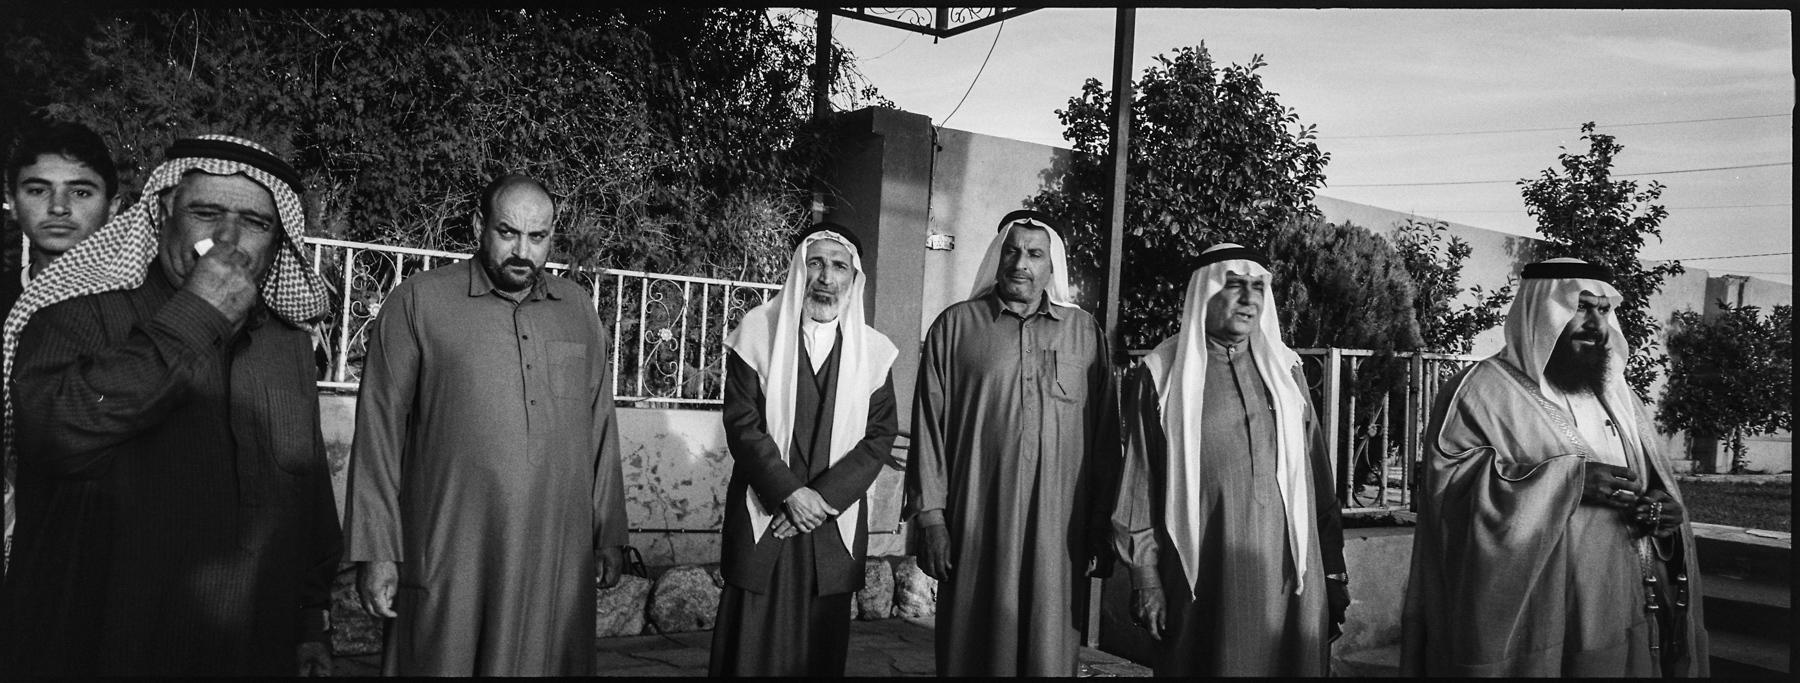 Sunni Tribal Leaders. Mosul, 2017.